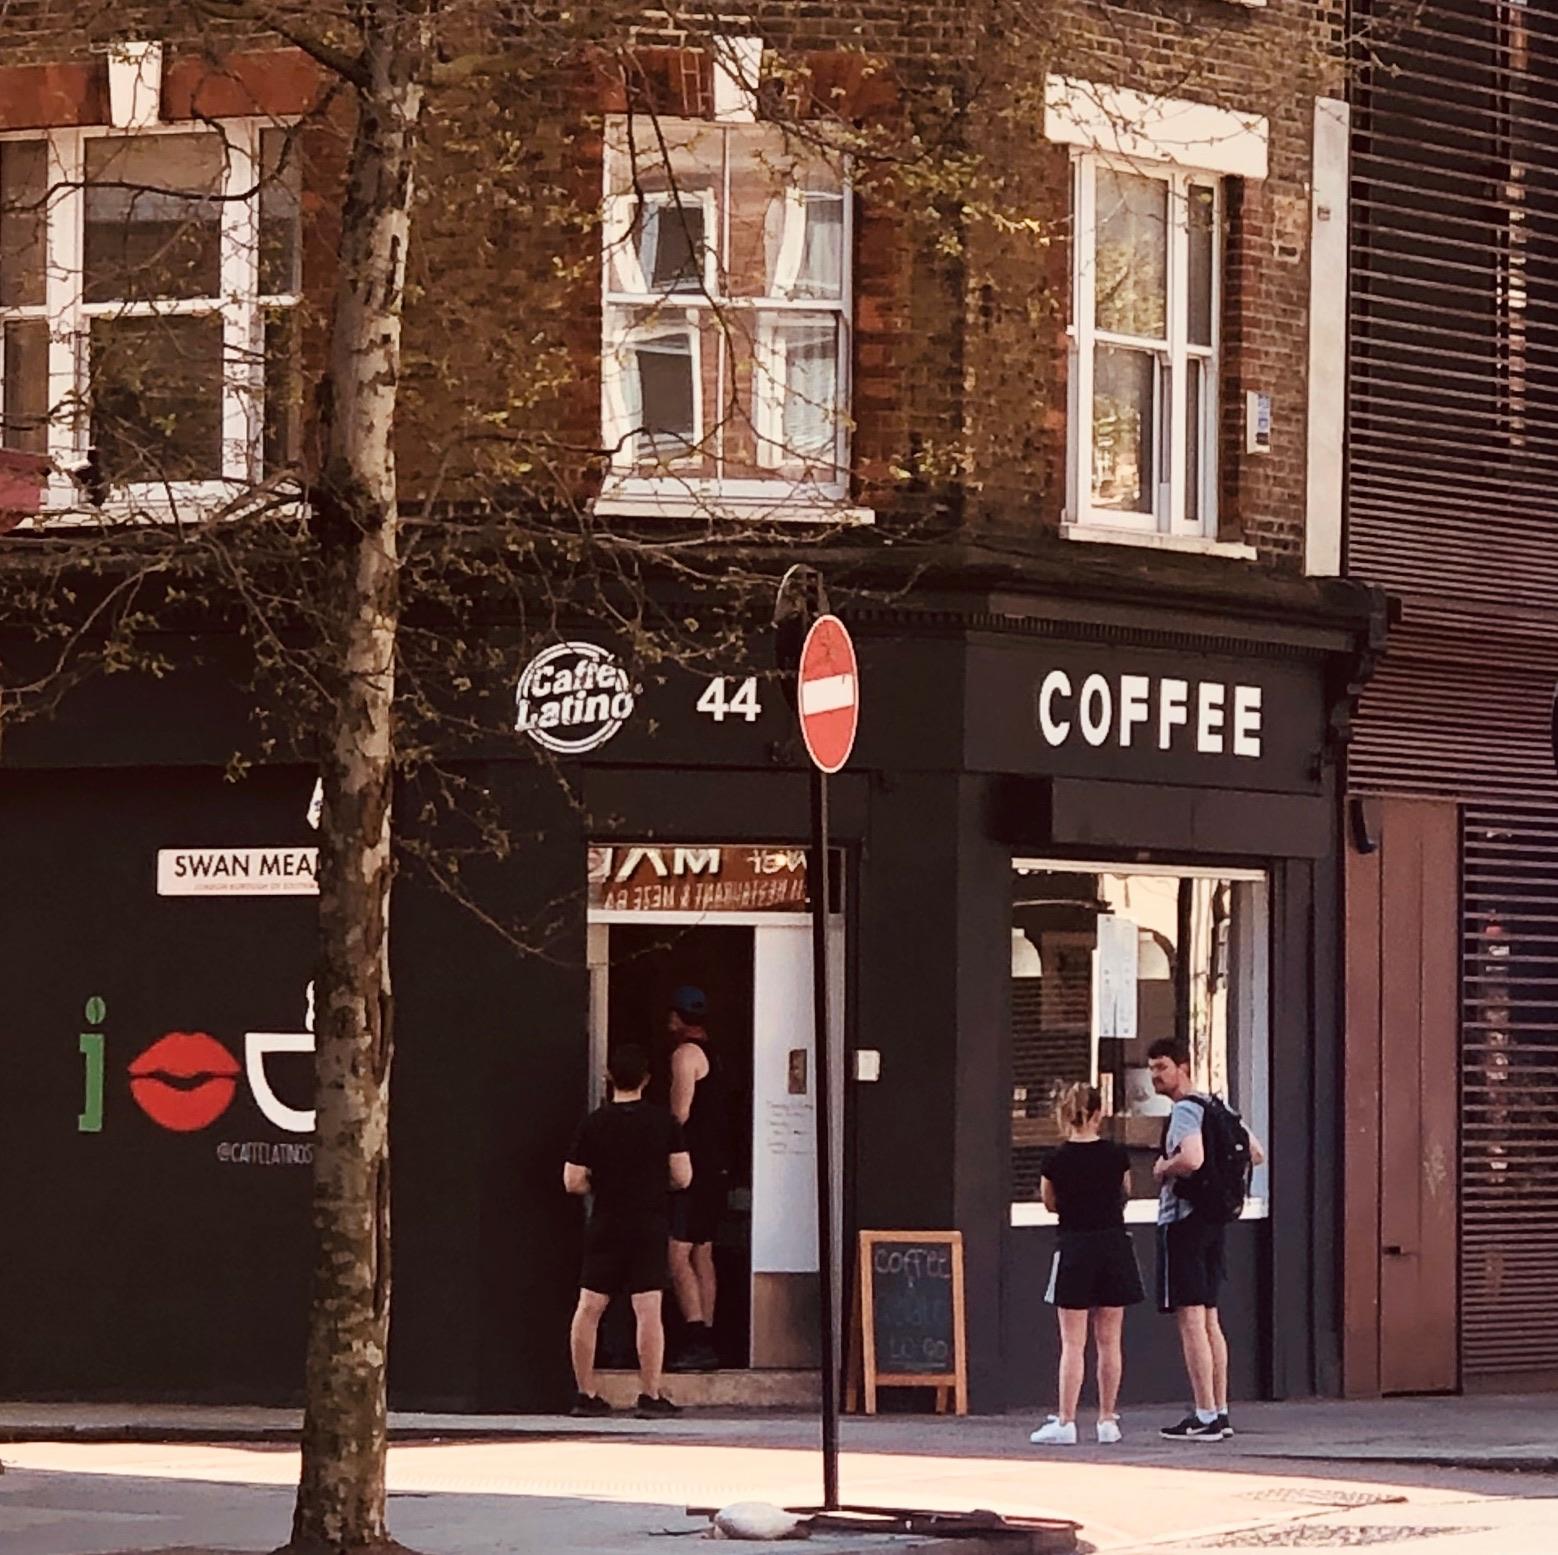 Caffe Latino